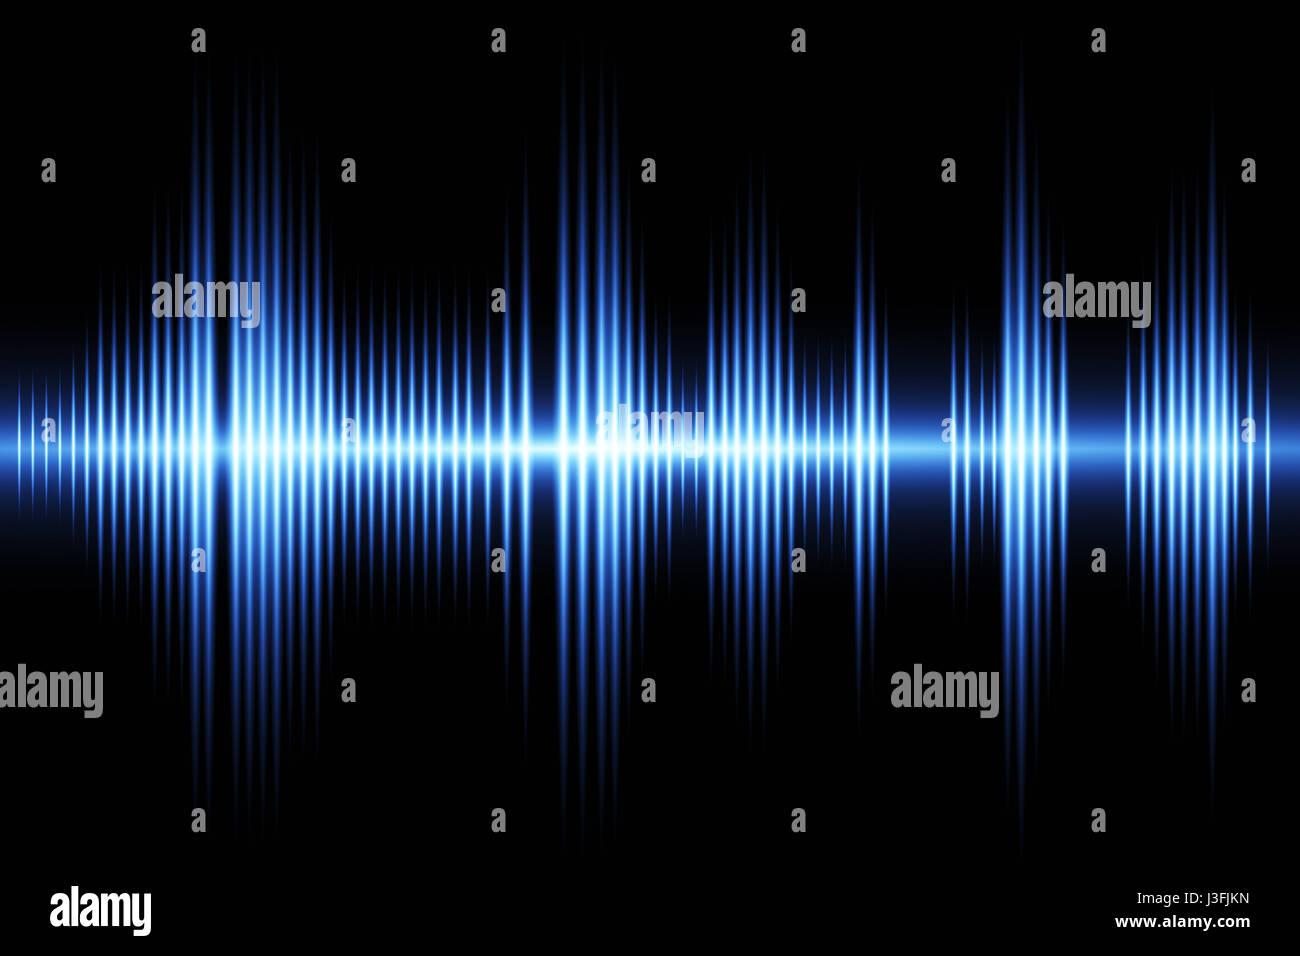 Equalizer sound wave background theme - Stock Image